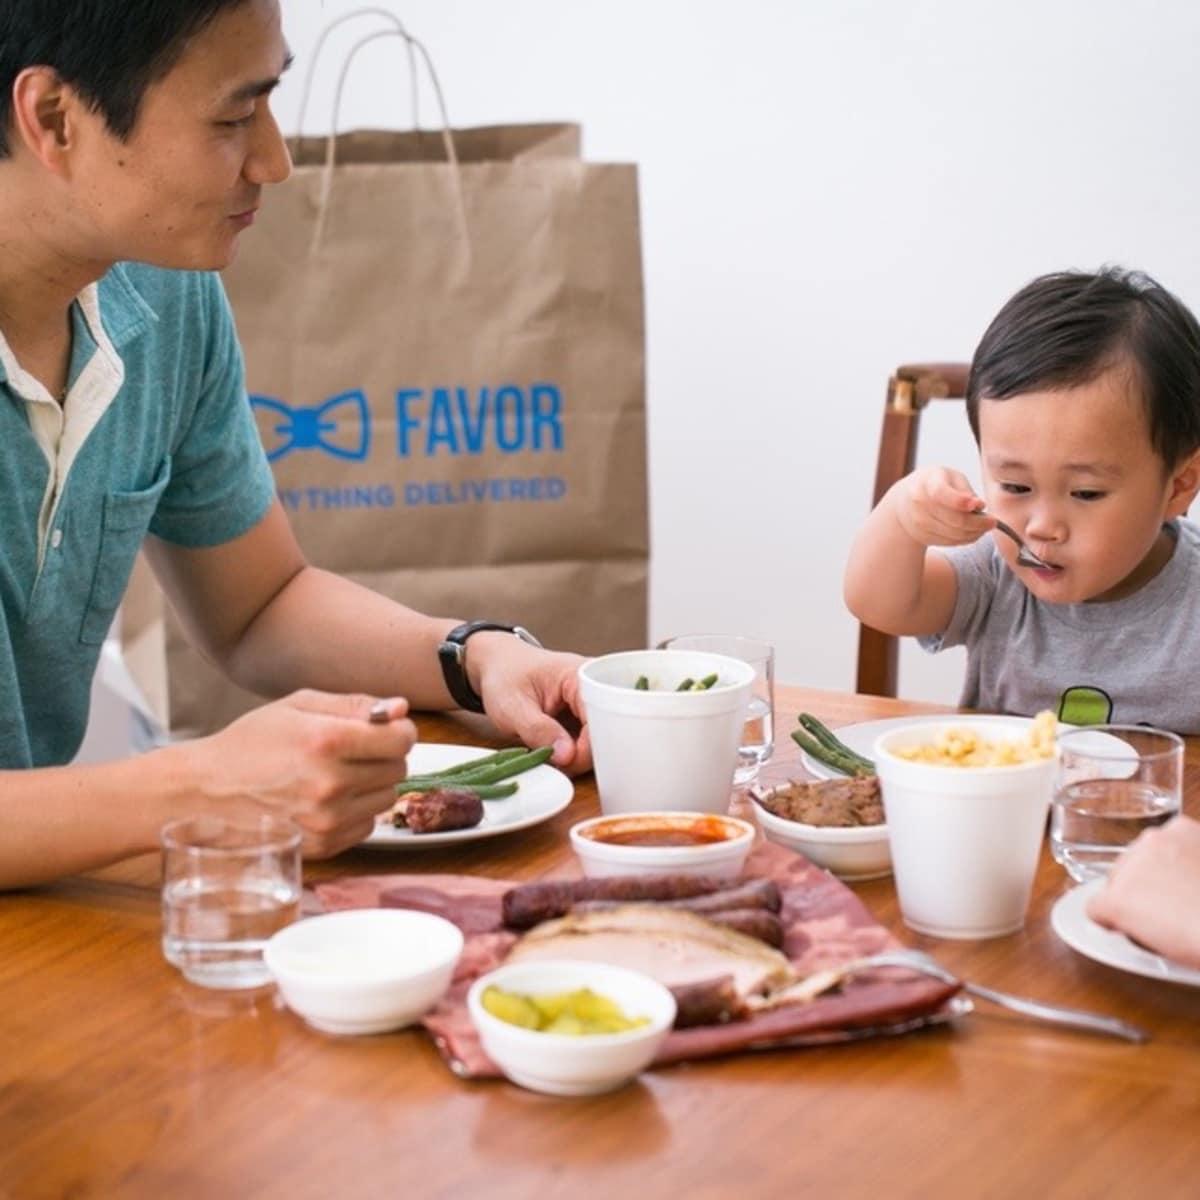 Favor delivery app customer